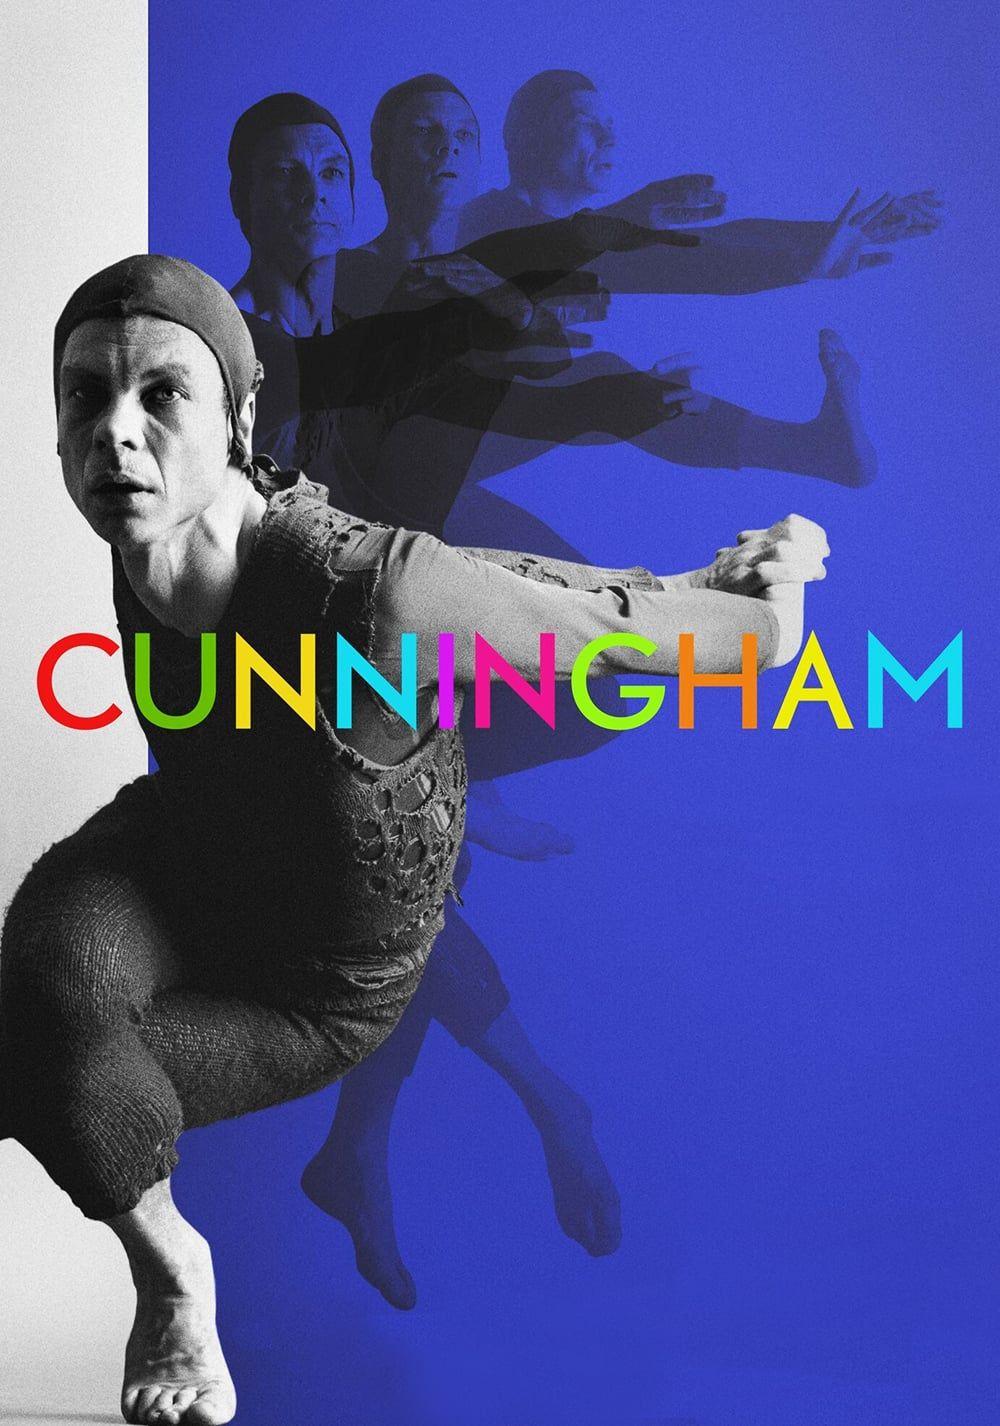 2 Cunningham Teljes Film Videa Hd Indavideo Magyarul Full Movies Online Free Free Movies Online Streaming Movies Online